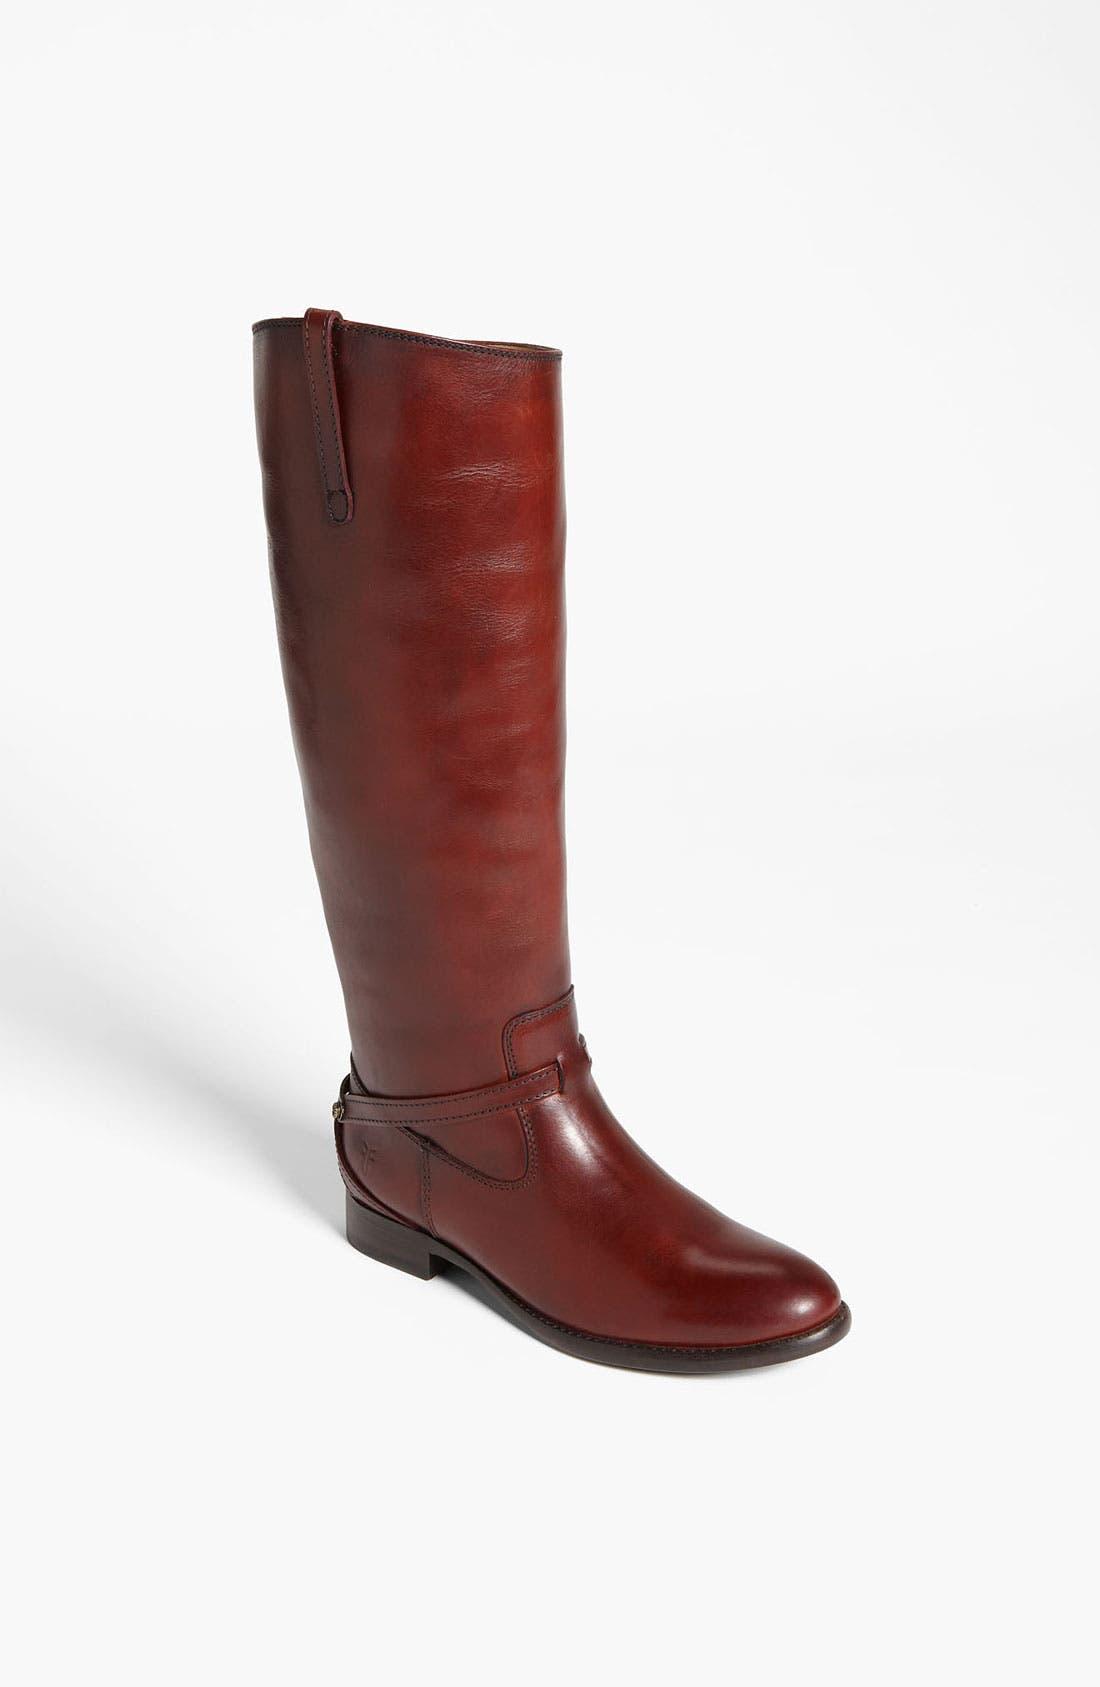 Main Image - Frye 'Lindsay Plate' Boot